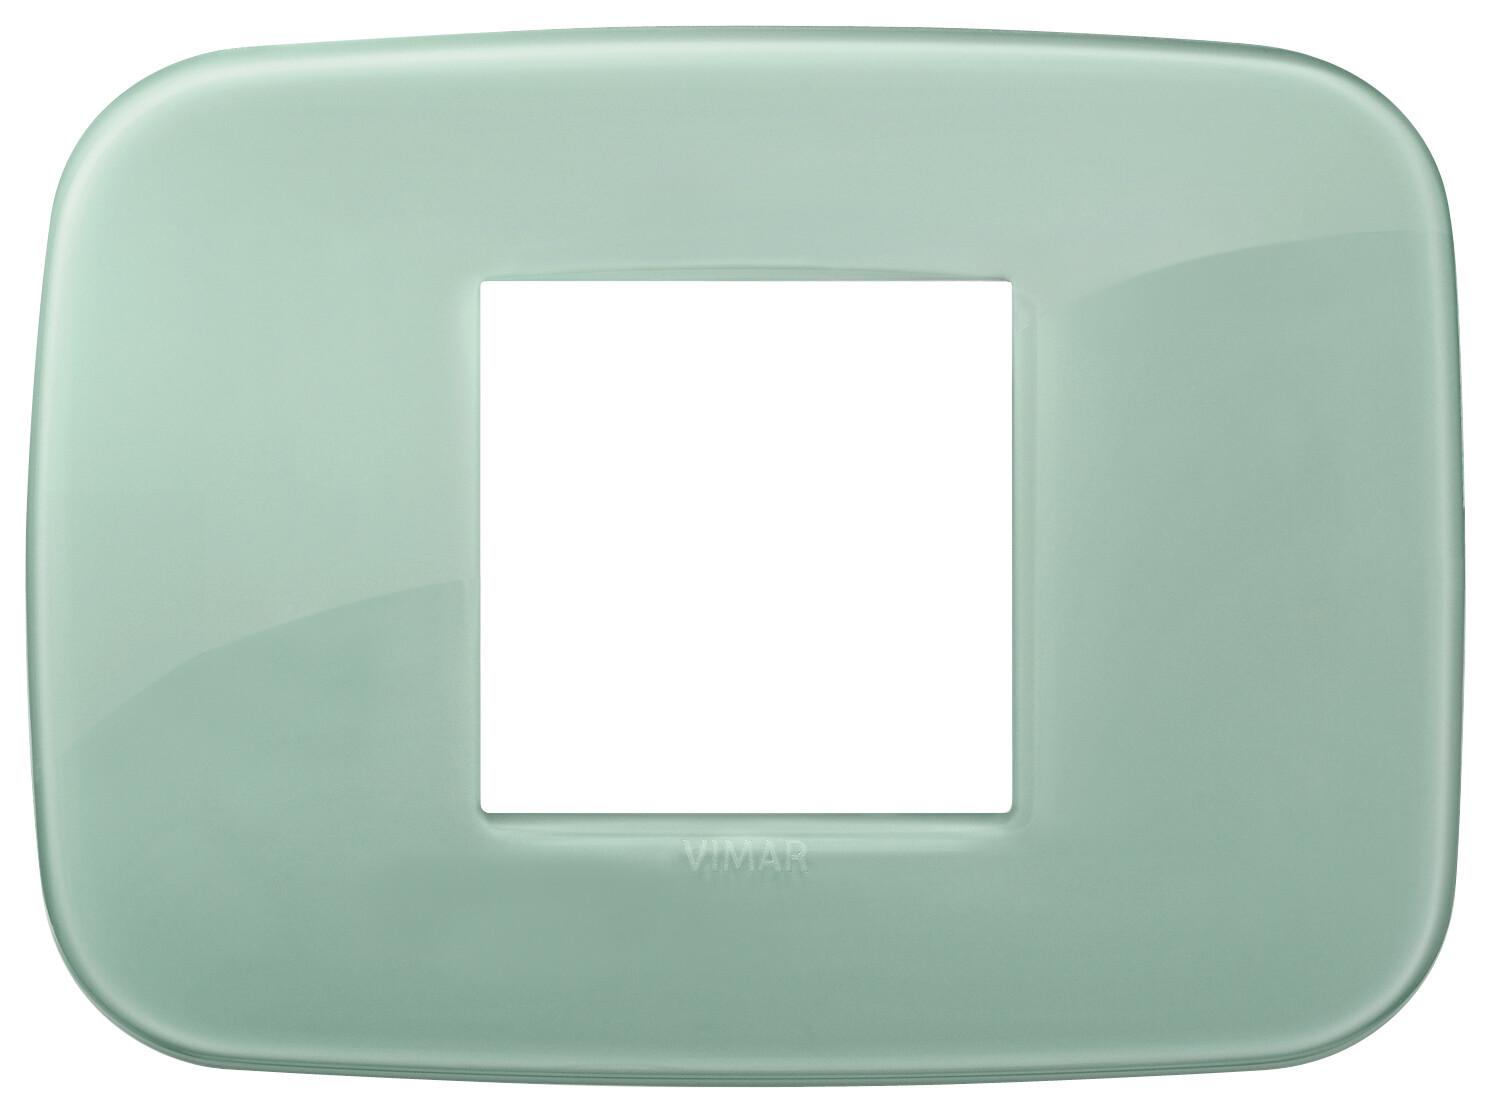 Накладка ROUND на 2 модуля центрально Reflex шалфейная